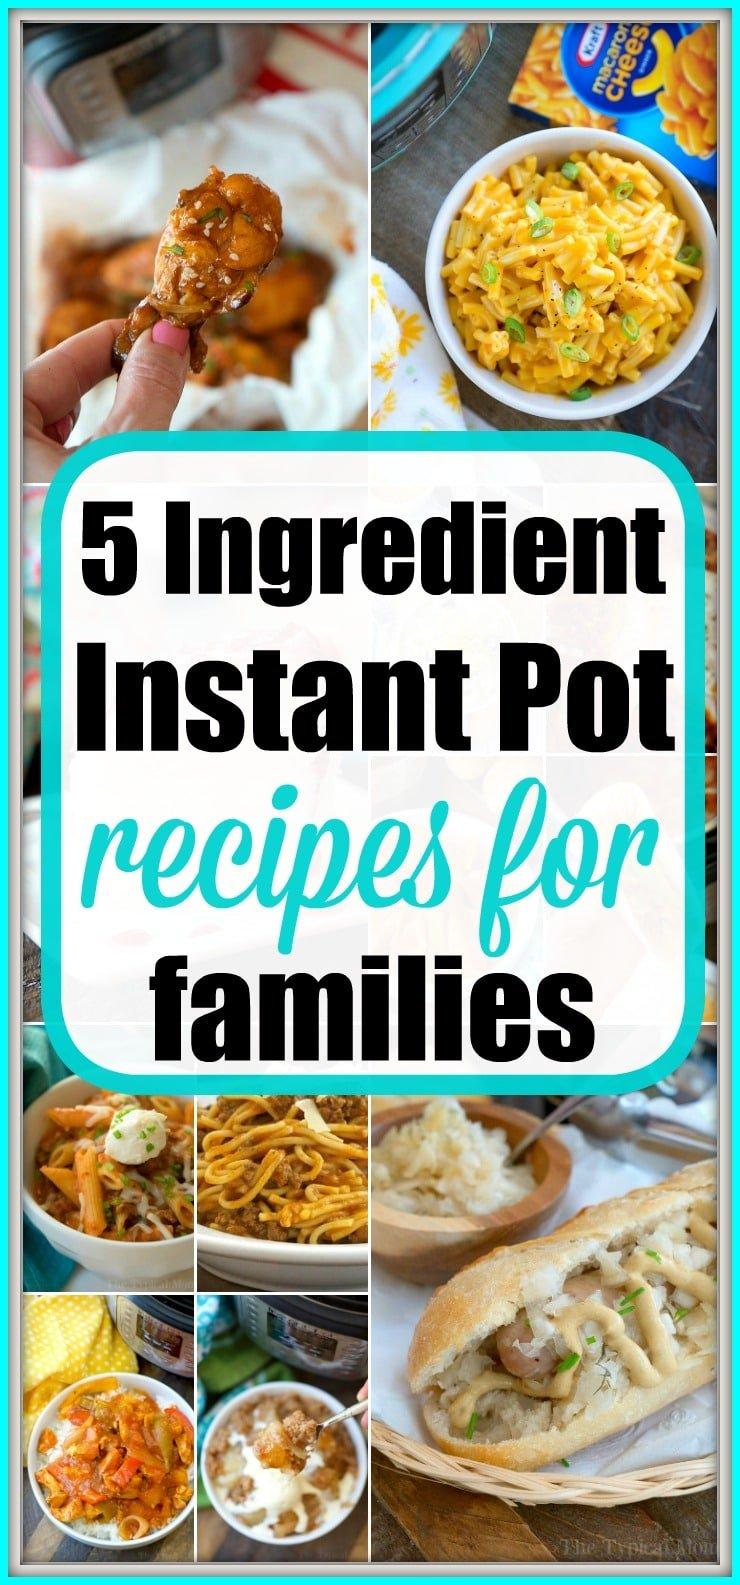 5 ingredient instant pot recipes